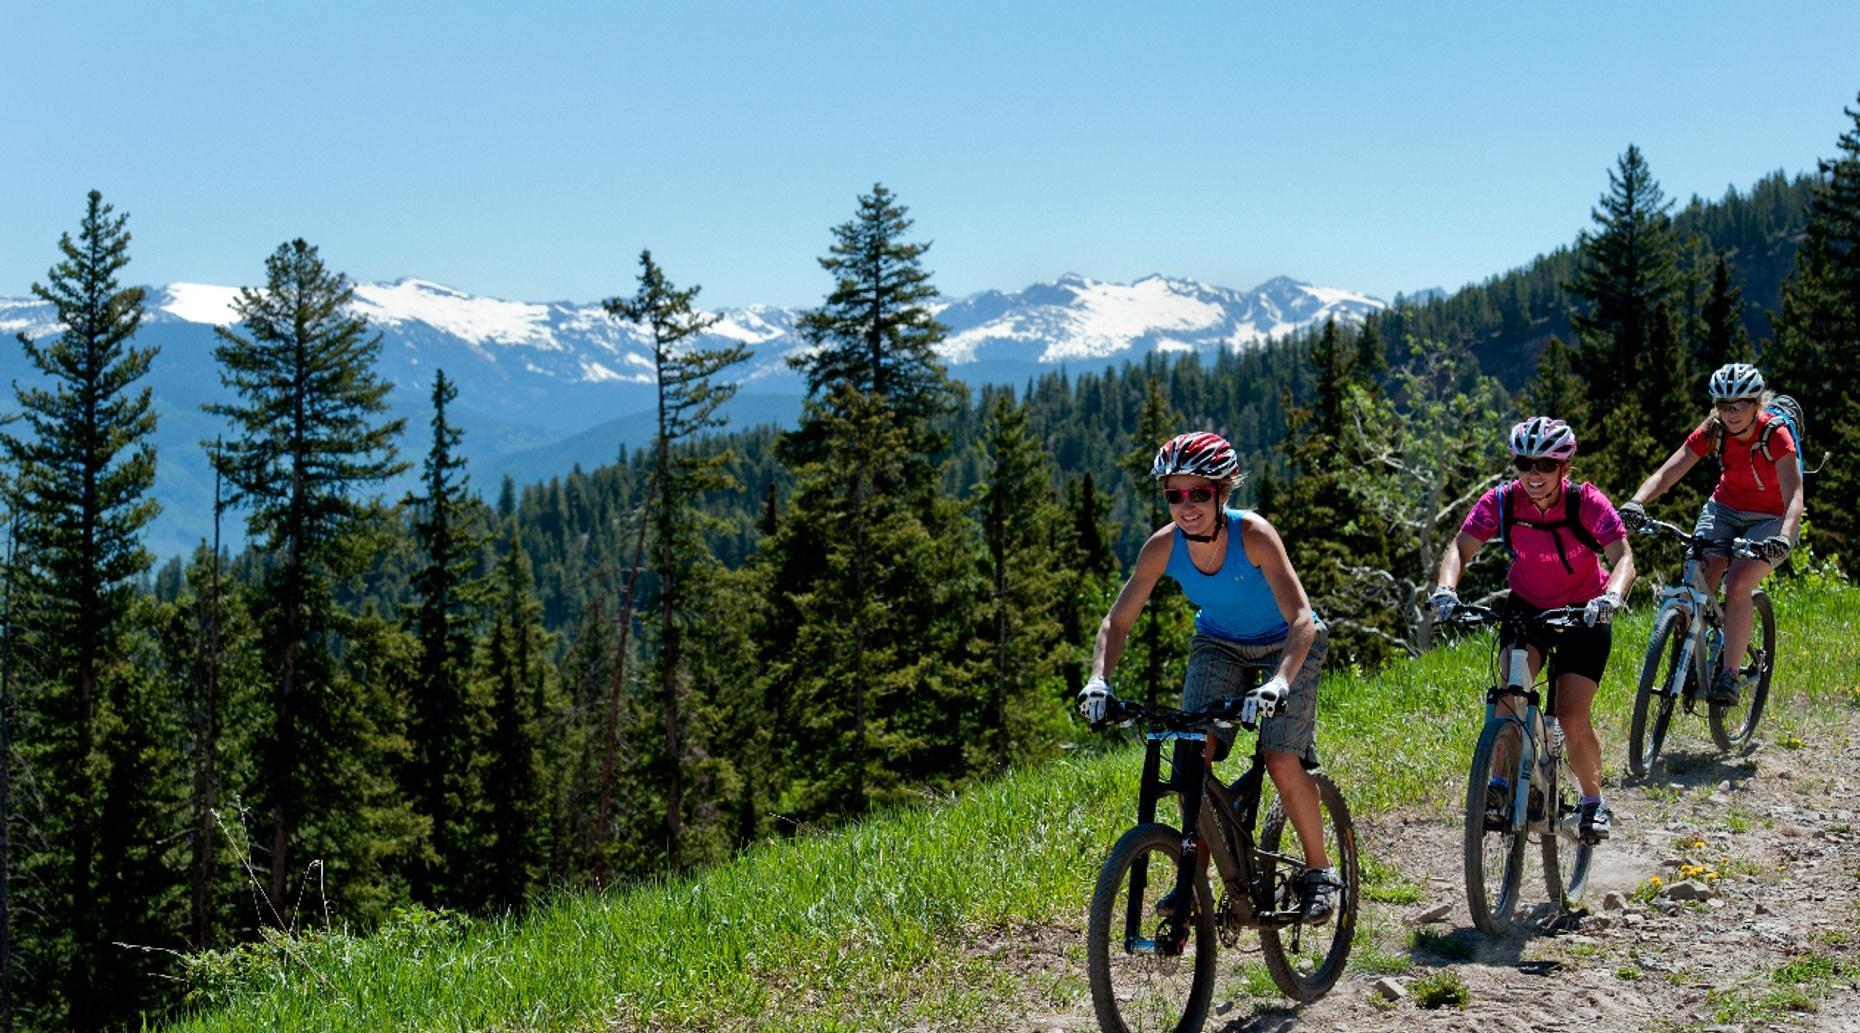 Private Mountain Biking Tour in Lake Tahoe